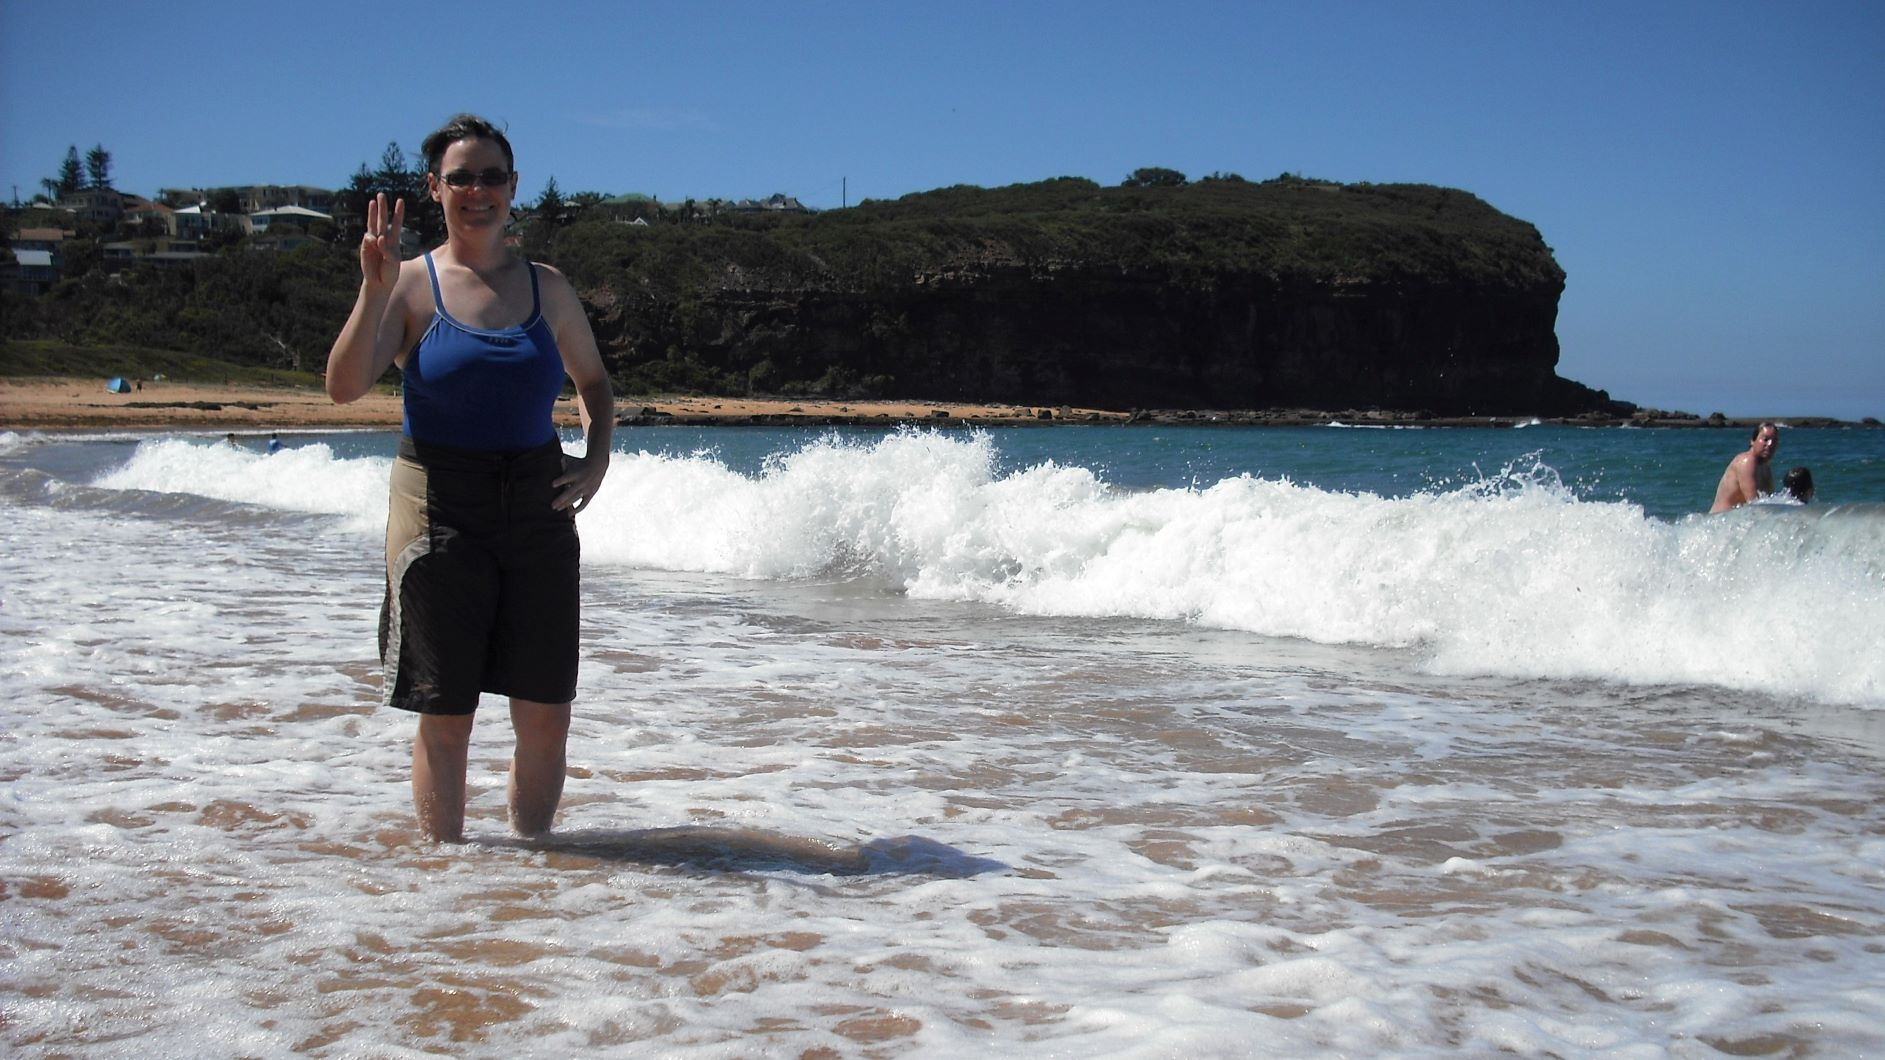 No 3: Basin Beach – 27 February 2010